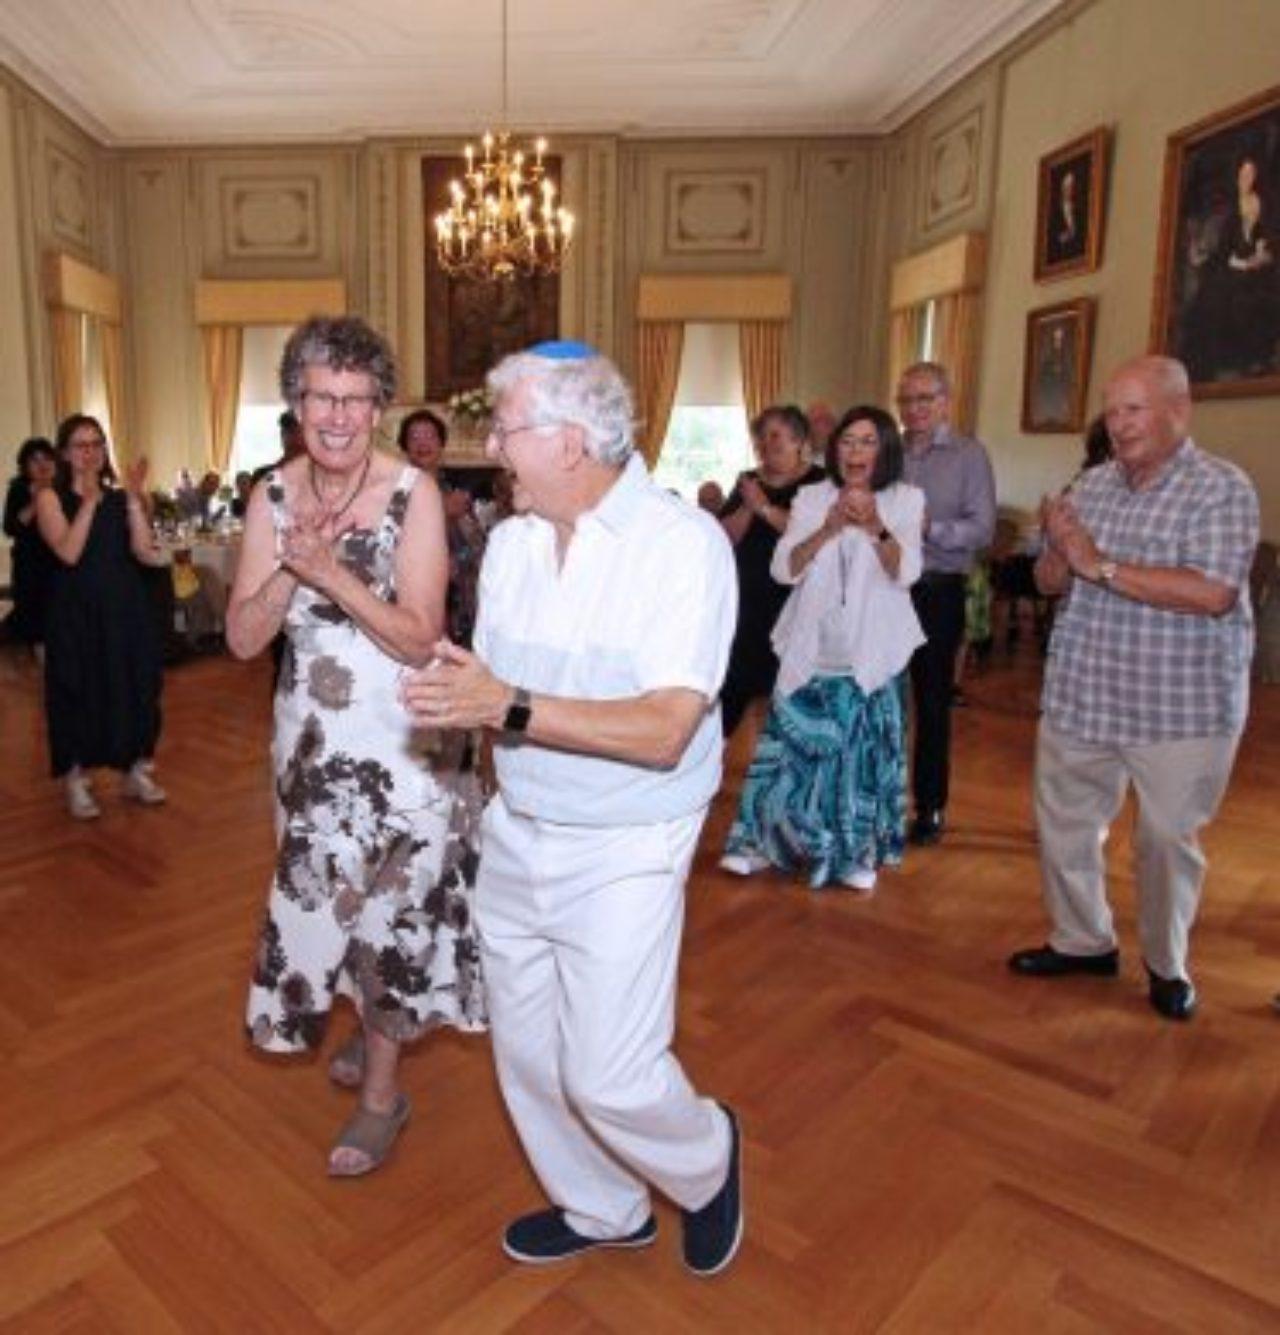 Ullman and Hoffman dancing